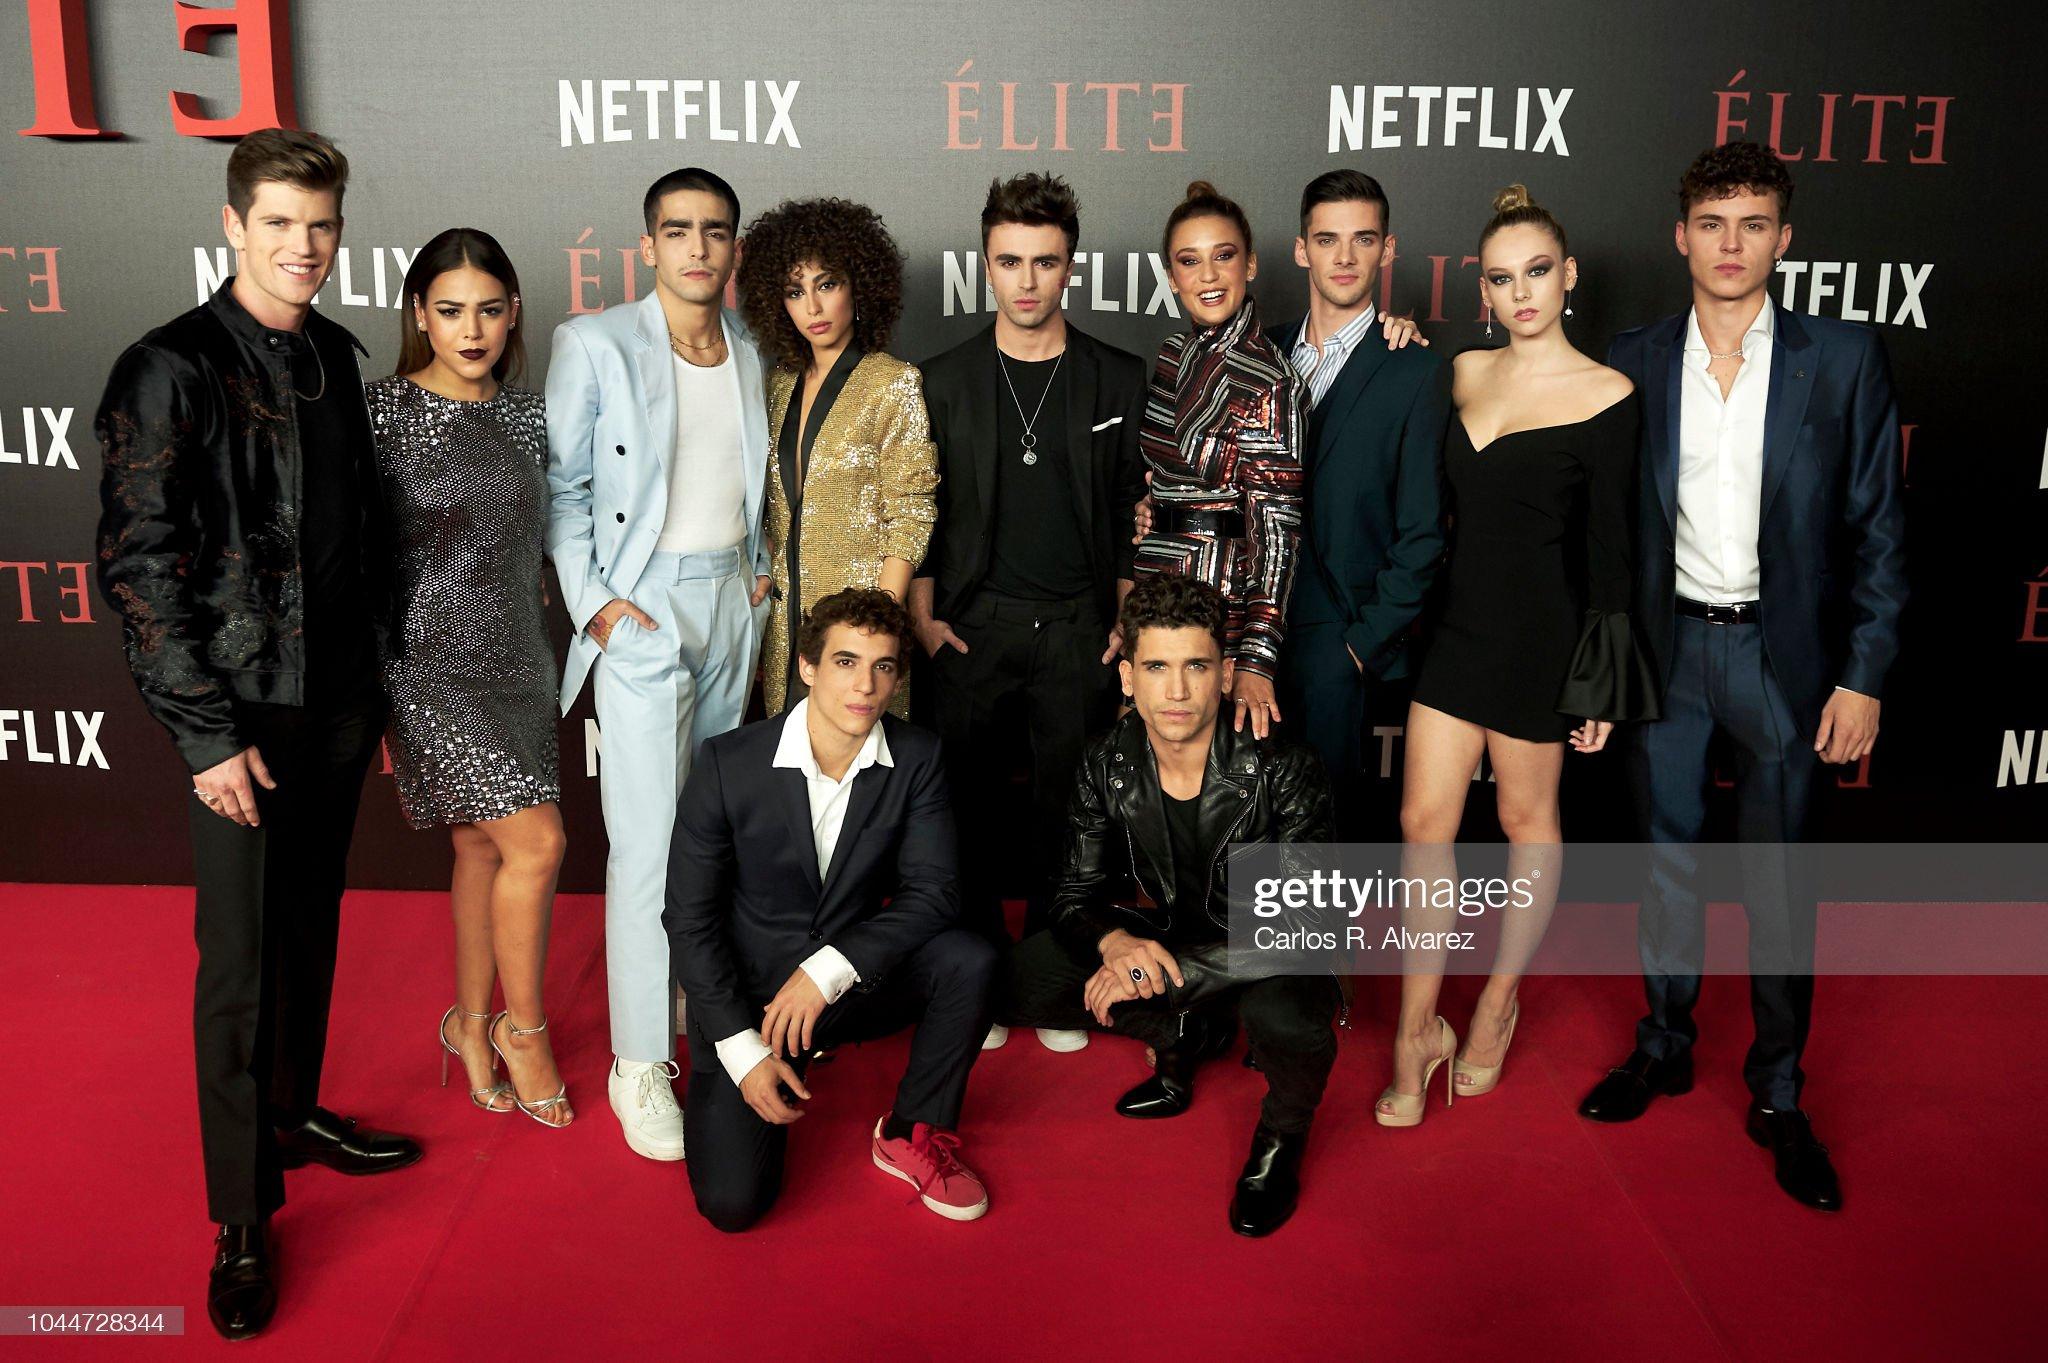 ¿Cuánto mide Danna Paola? - Altura - Real height Actors-miguel-bernardeau-danna-paola-omar-ayuso-mina-el-hammani-itzan-picture-id1044728344?s=2048x2048